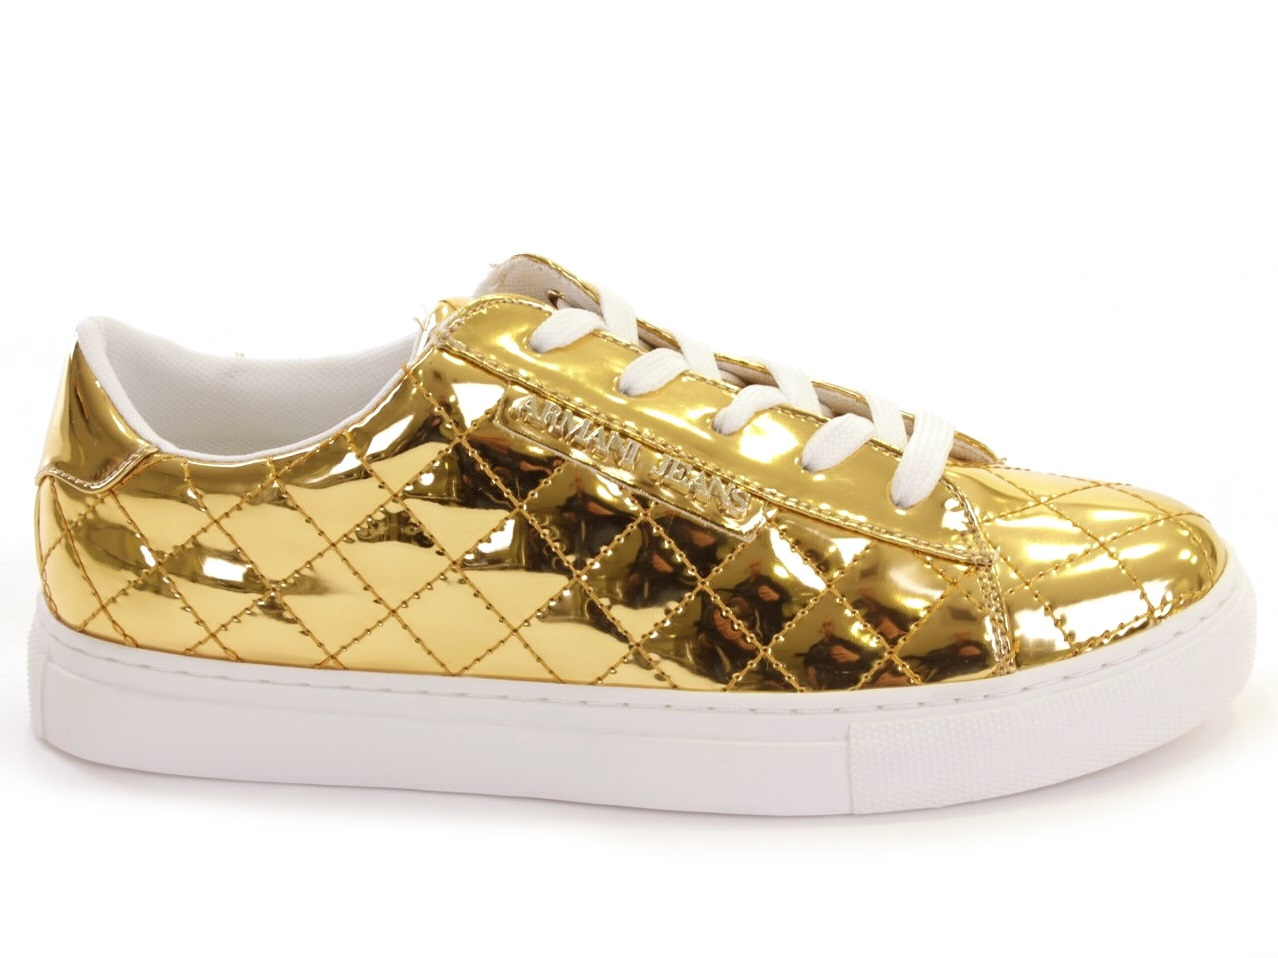 Sneakers and Espadrilles Armani, Emporio - 529 925197